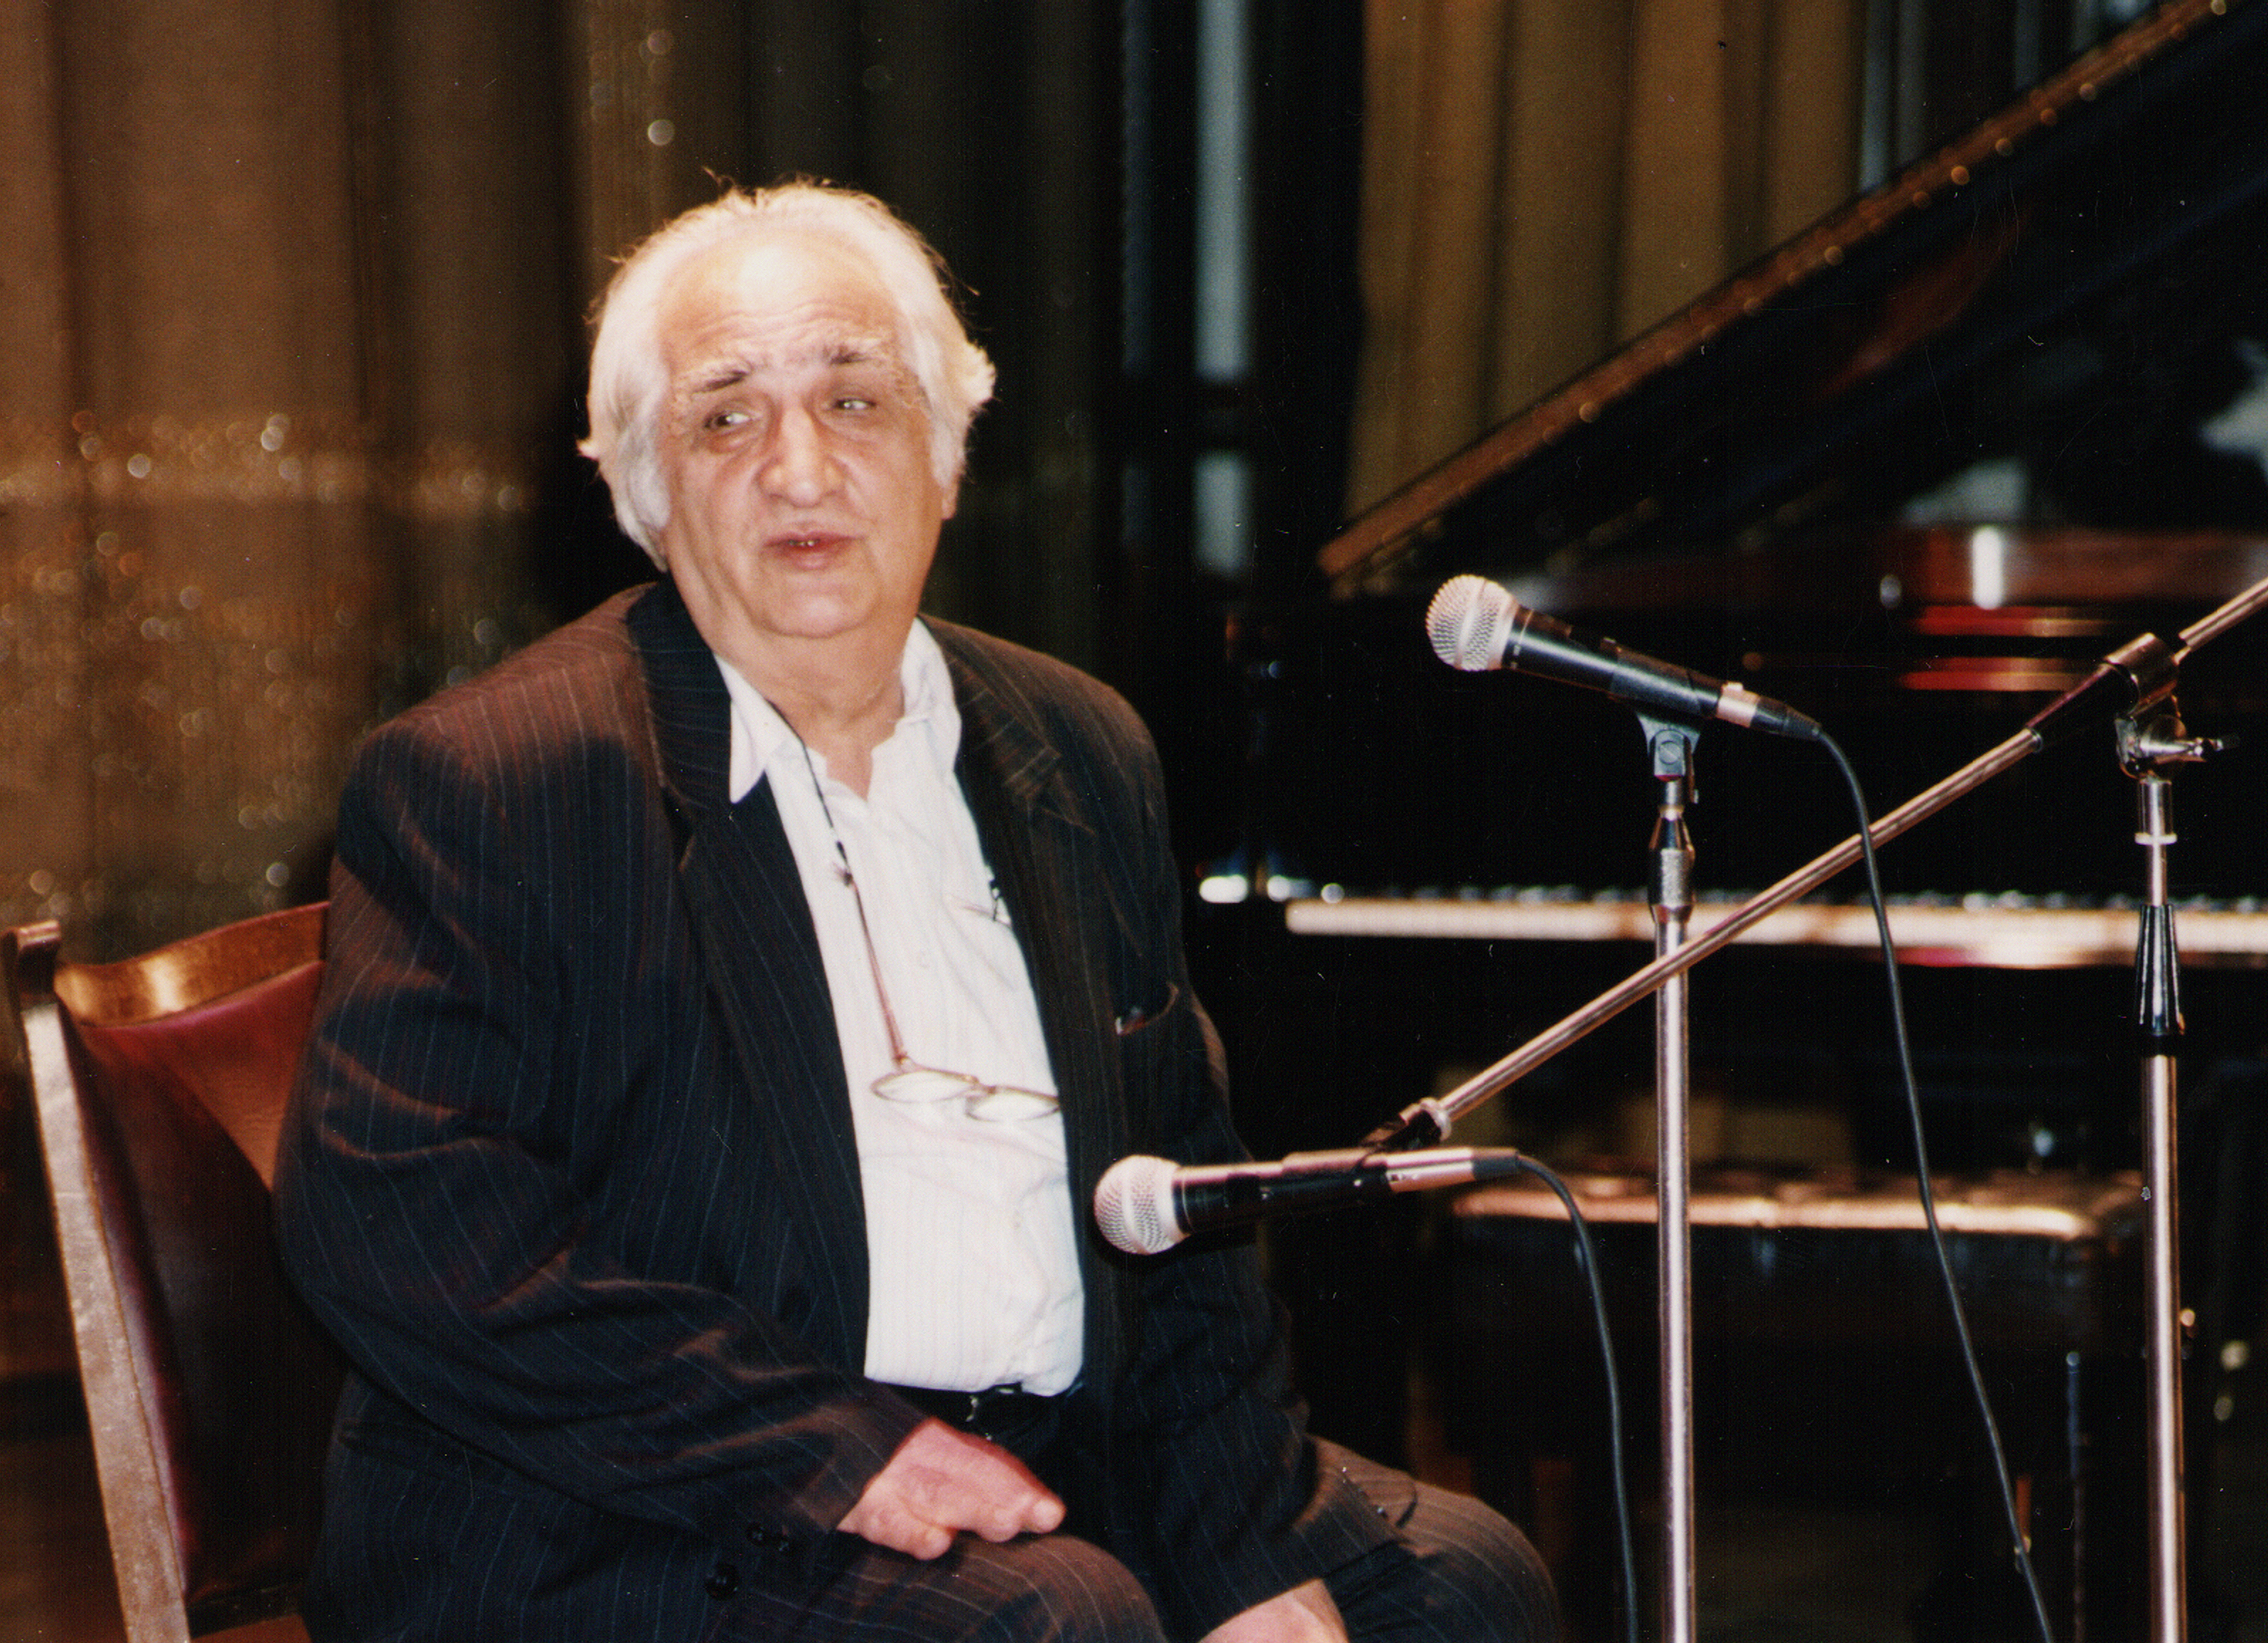 timofeevskiy-al-pavl-cdl-2000